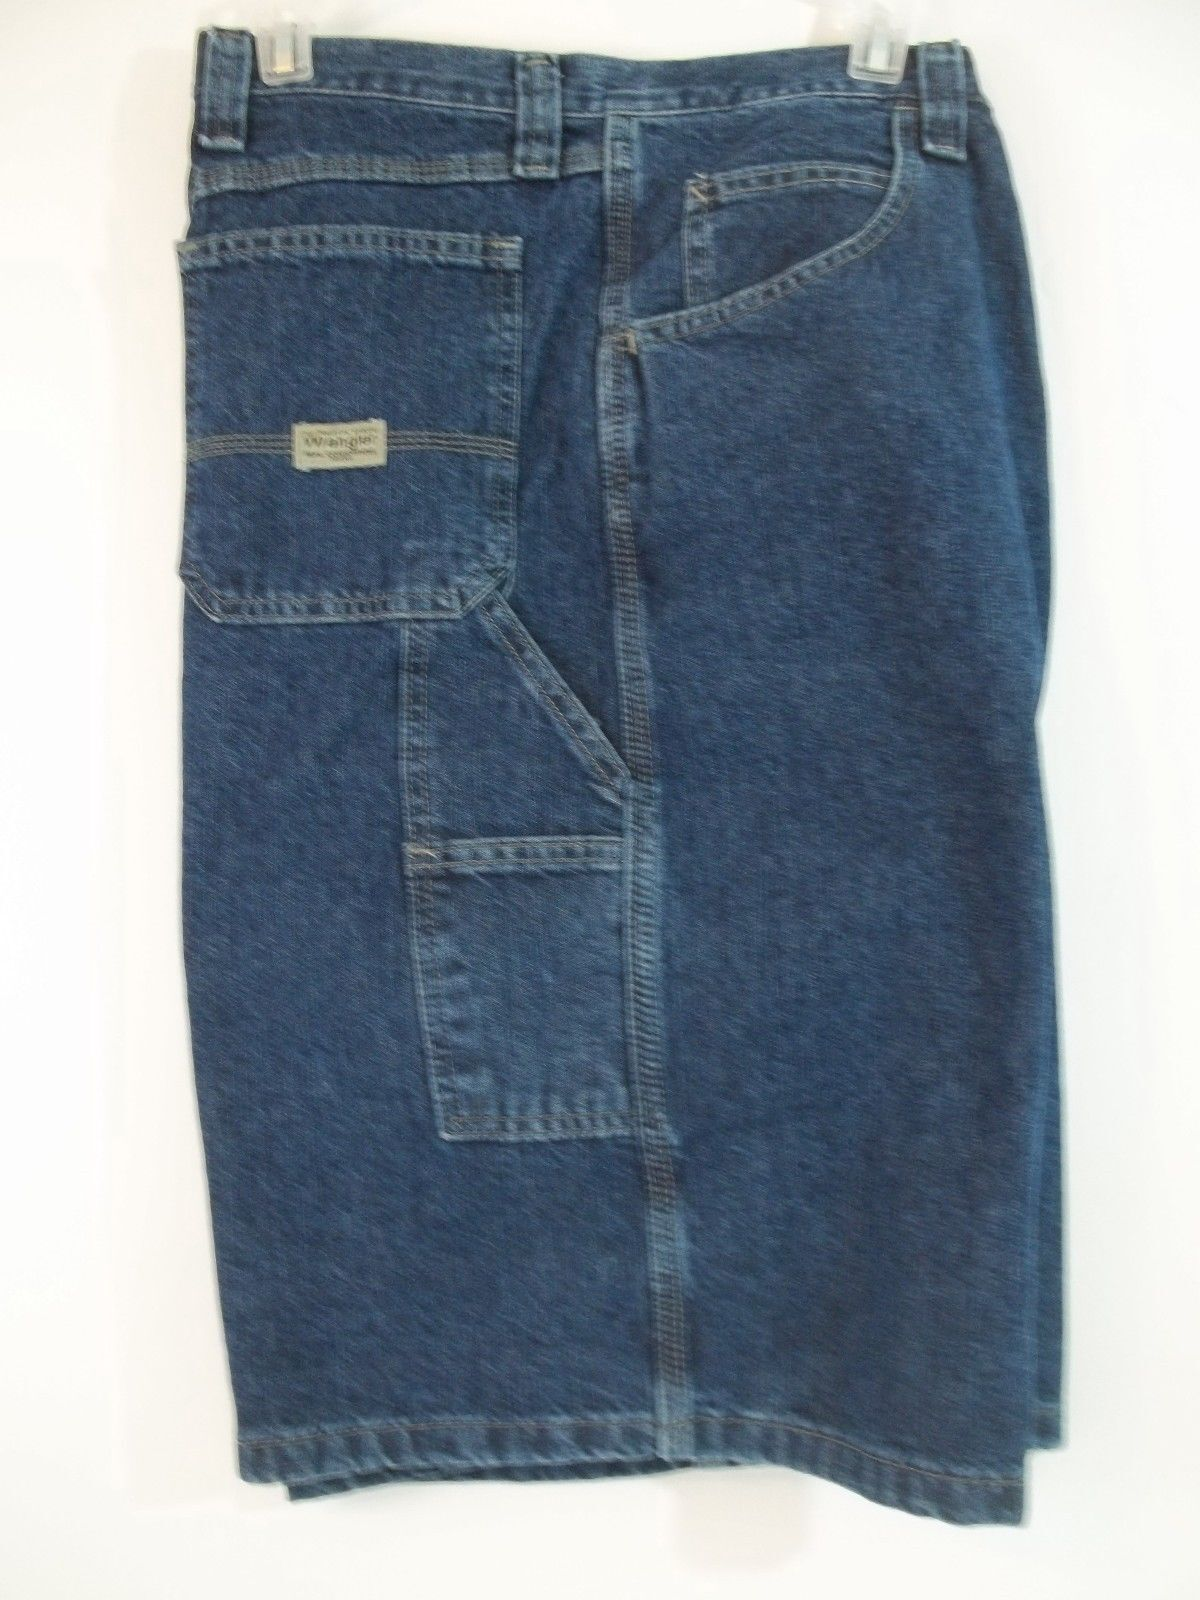 446ab74f Wrangler Denim Jeans Cargo Carpenter Shorts Loose Fit Men's Size 46 ...